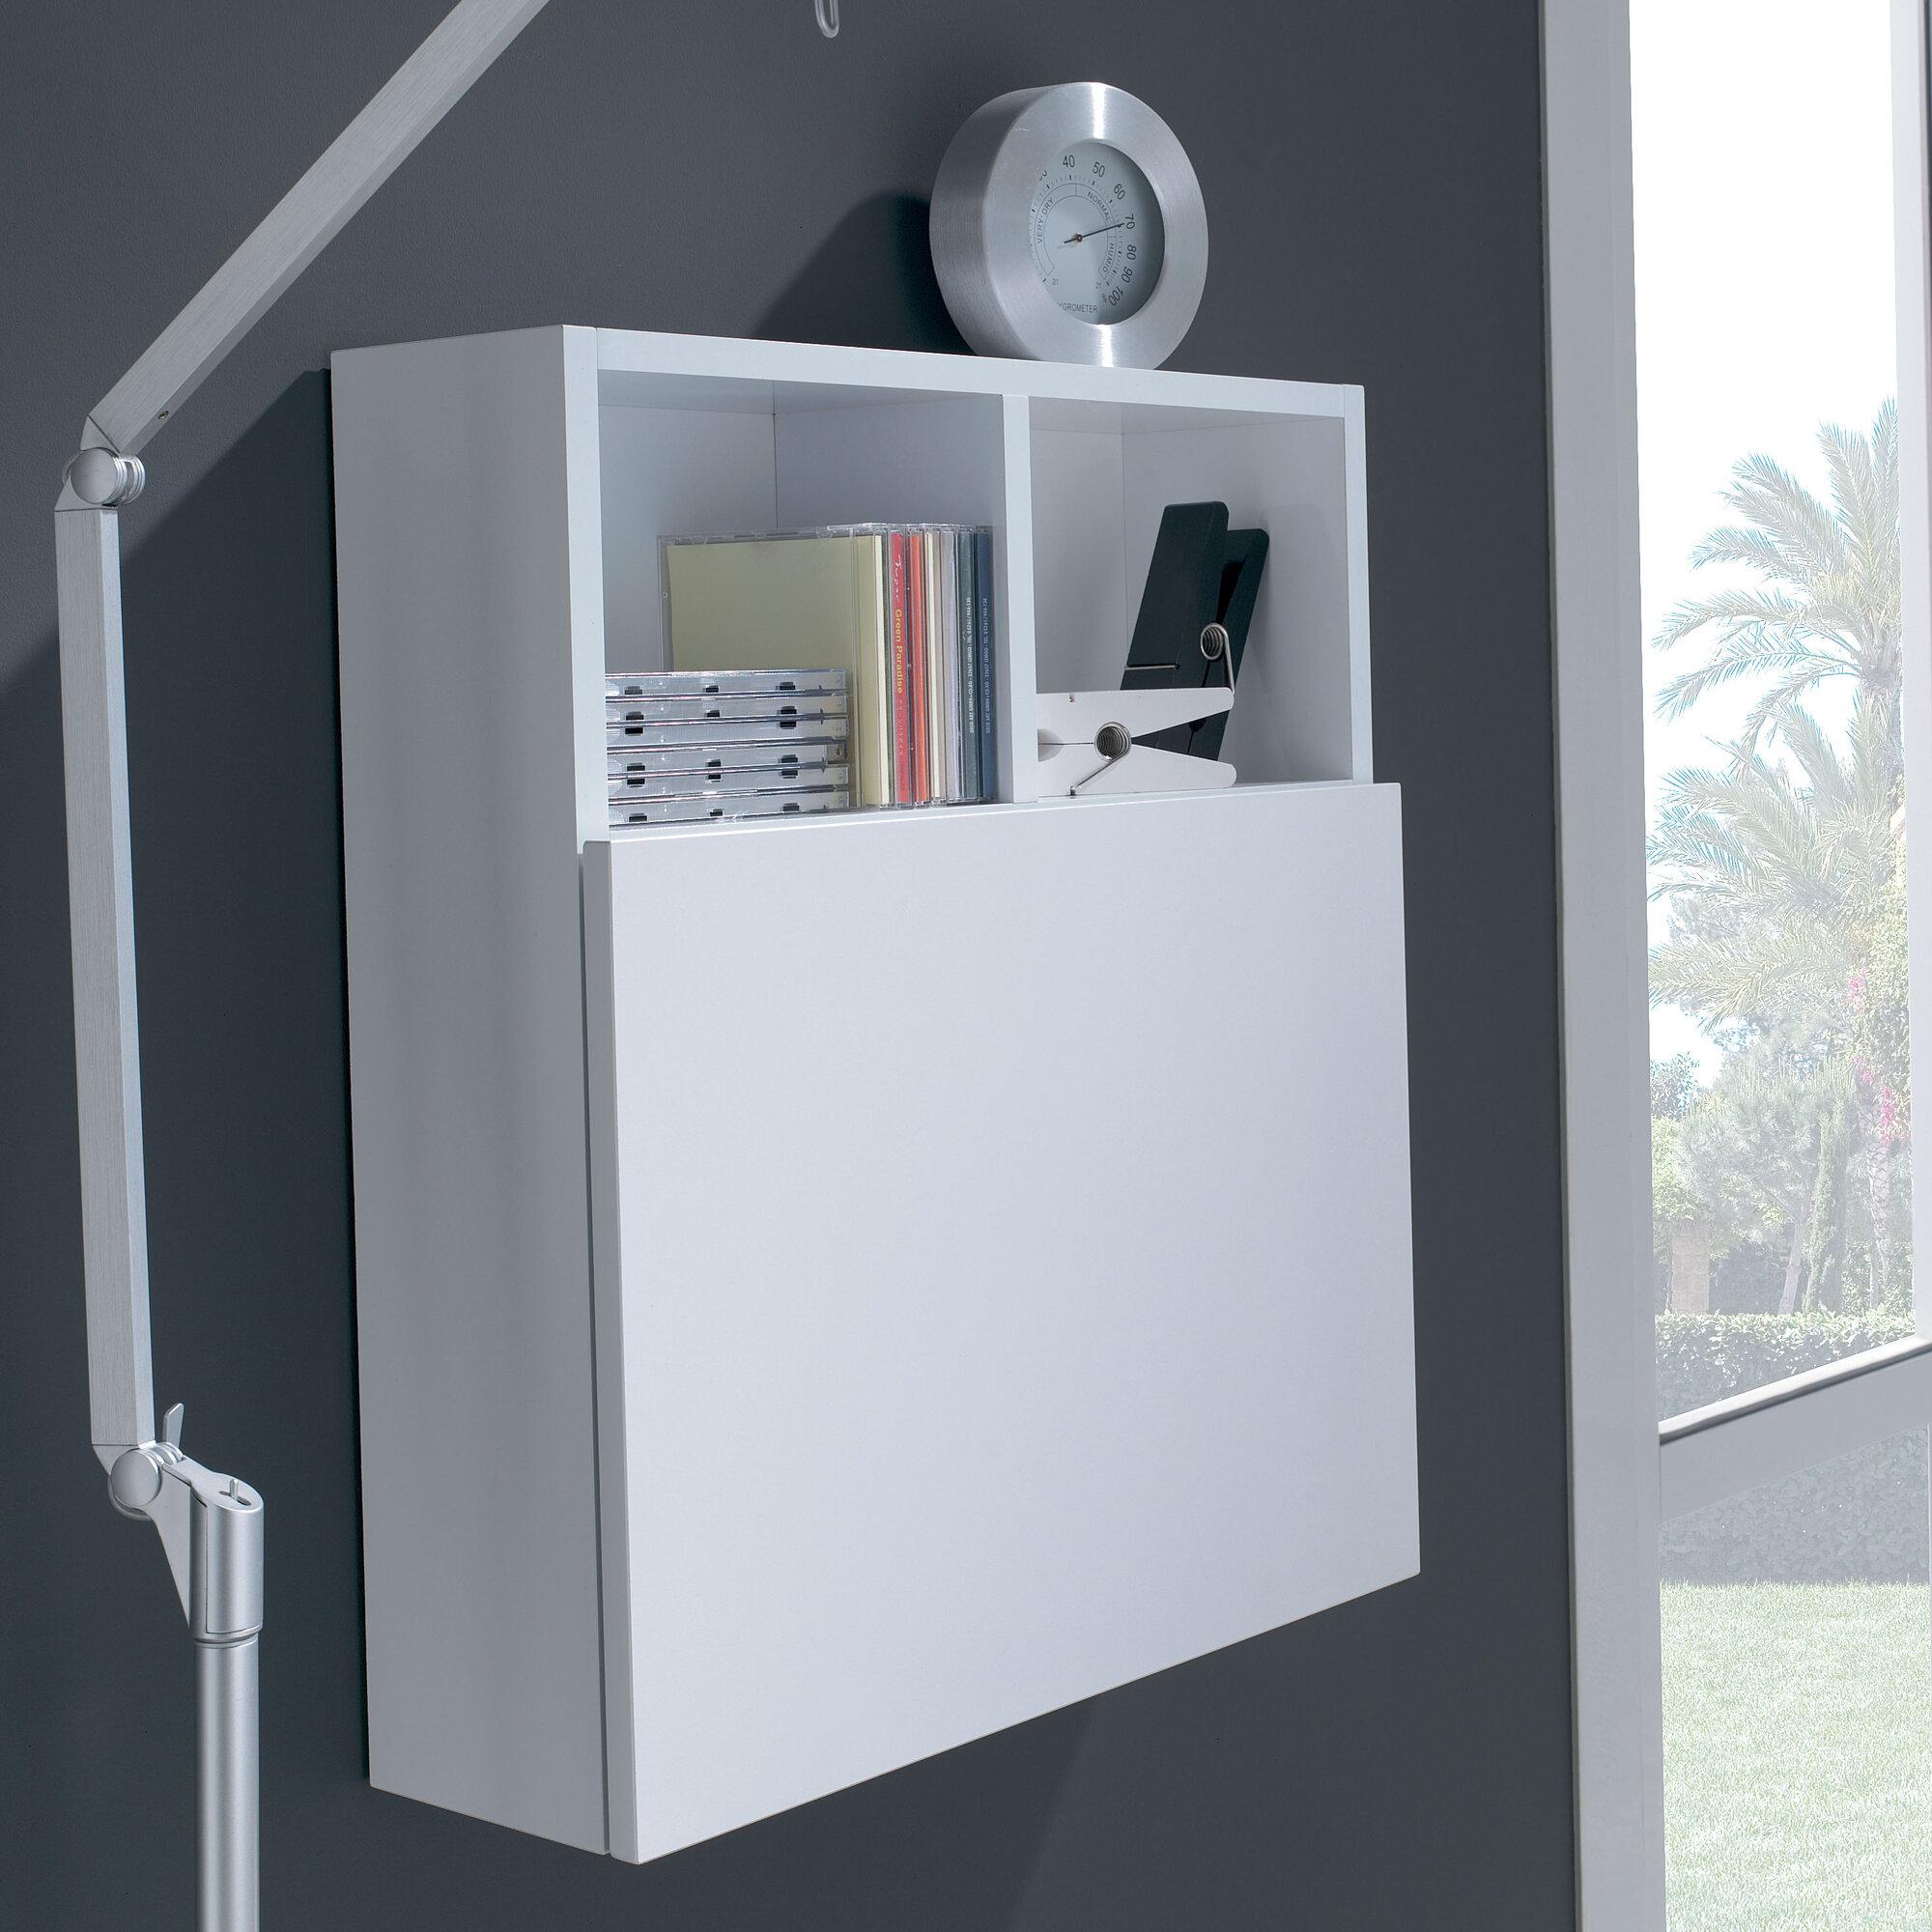 pelayomobles laptop schrank aufh ngbar mit faltt r ebay. Black Bedroom Furniture Sets. Home Design Ideas